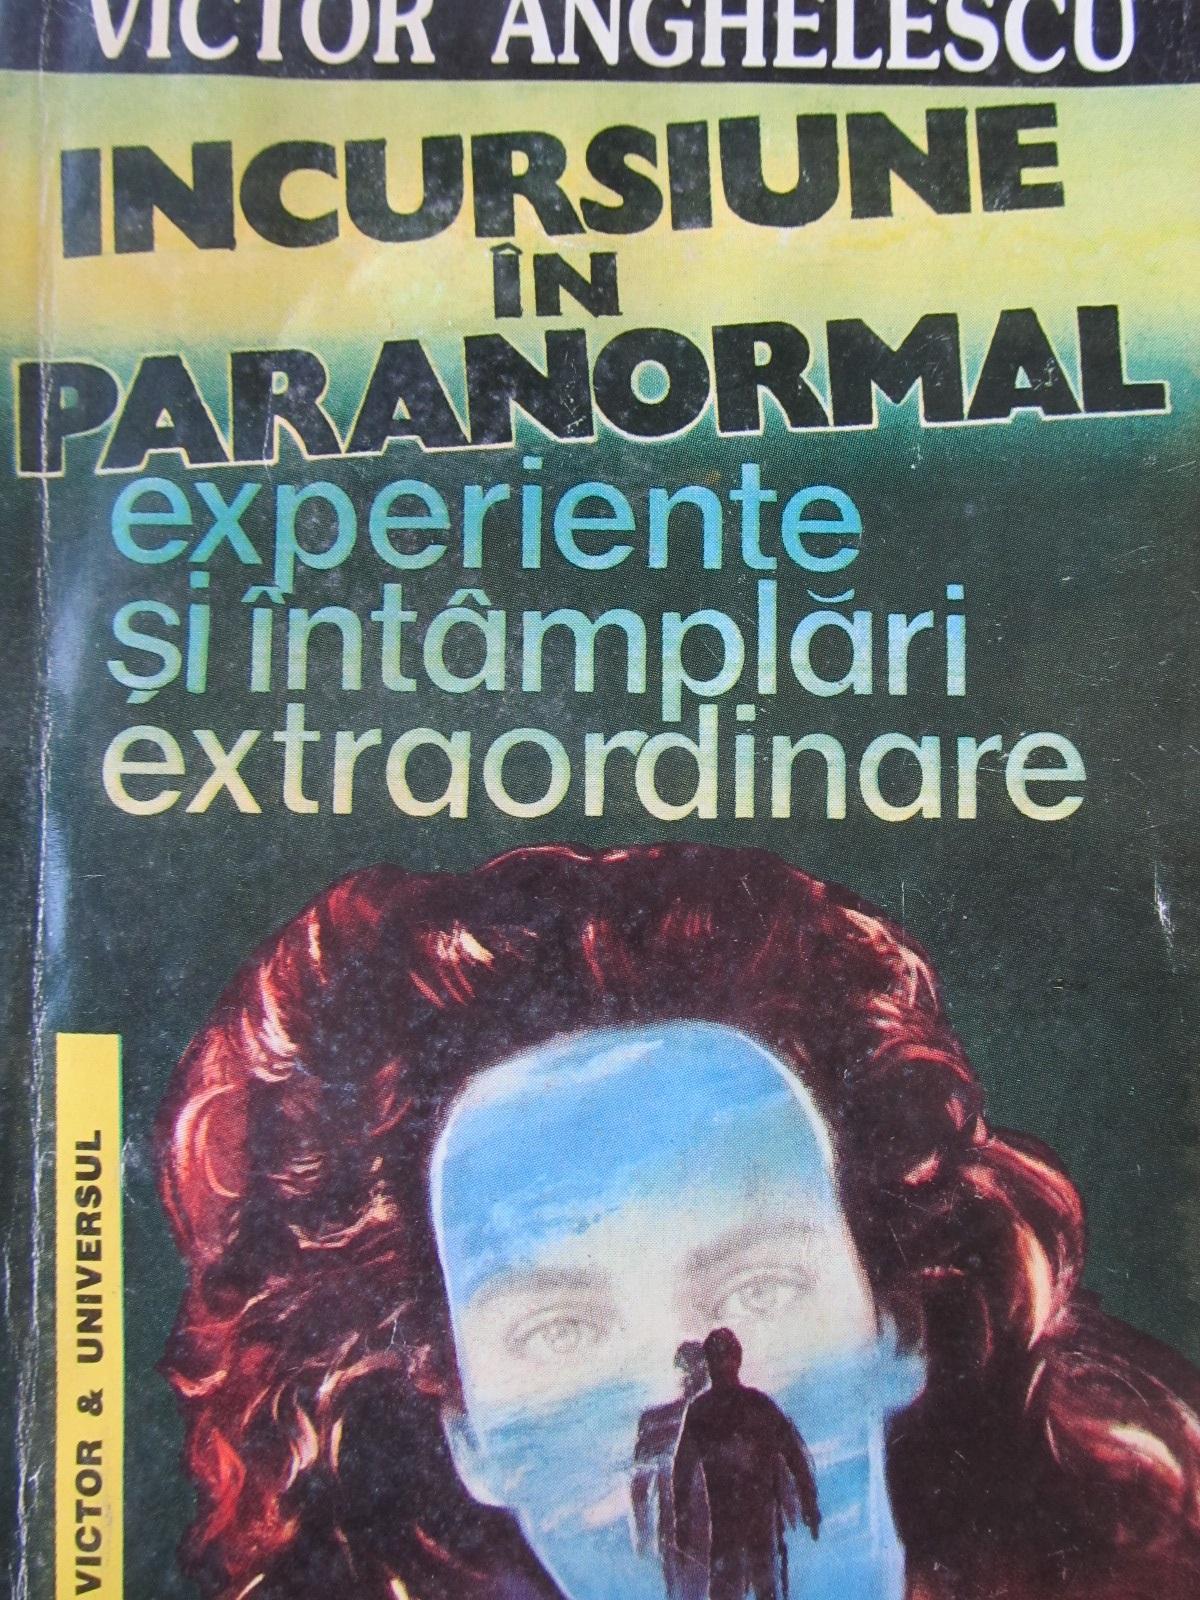 Incursiune in paranormal - Experiente si intamplari extraordinare - Victor Anghelescu | Detalii carte